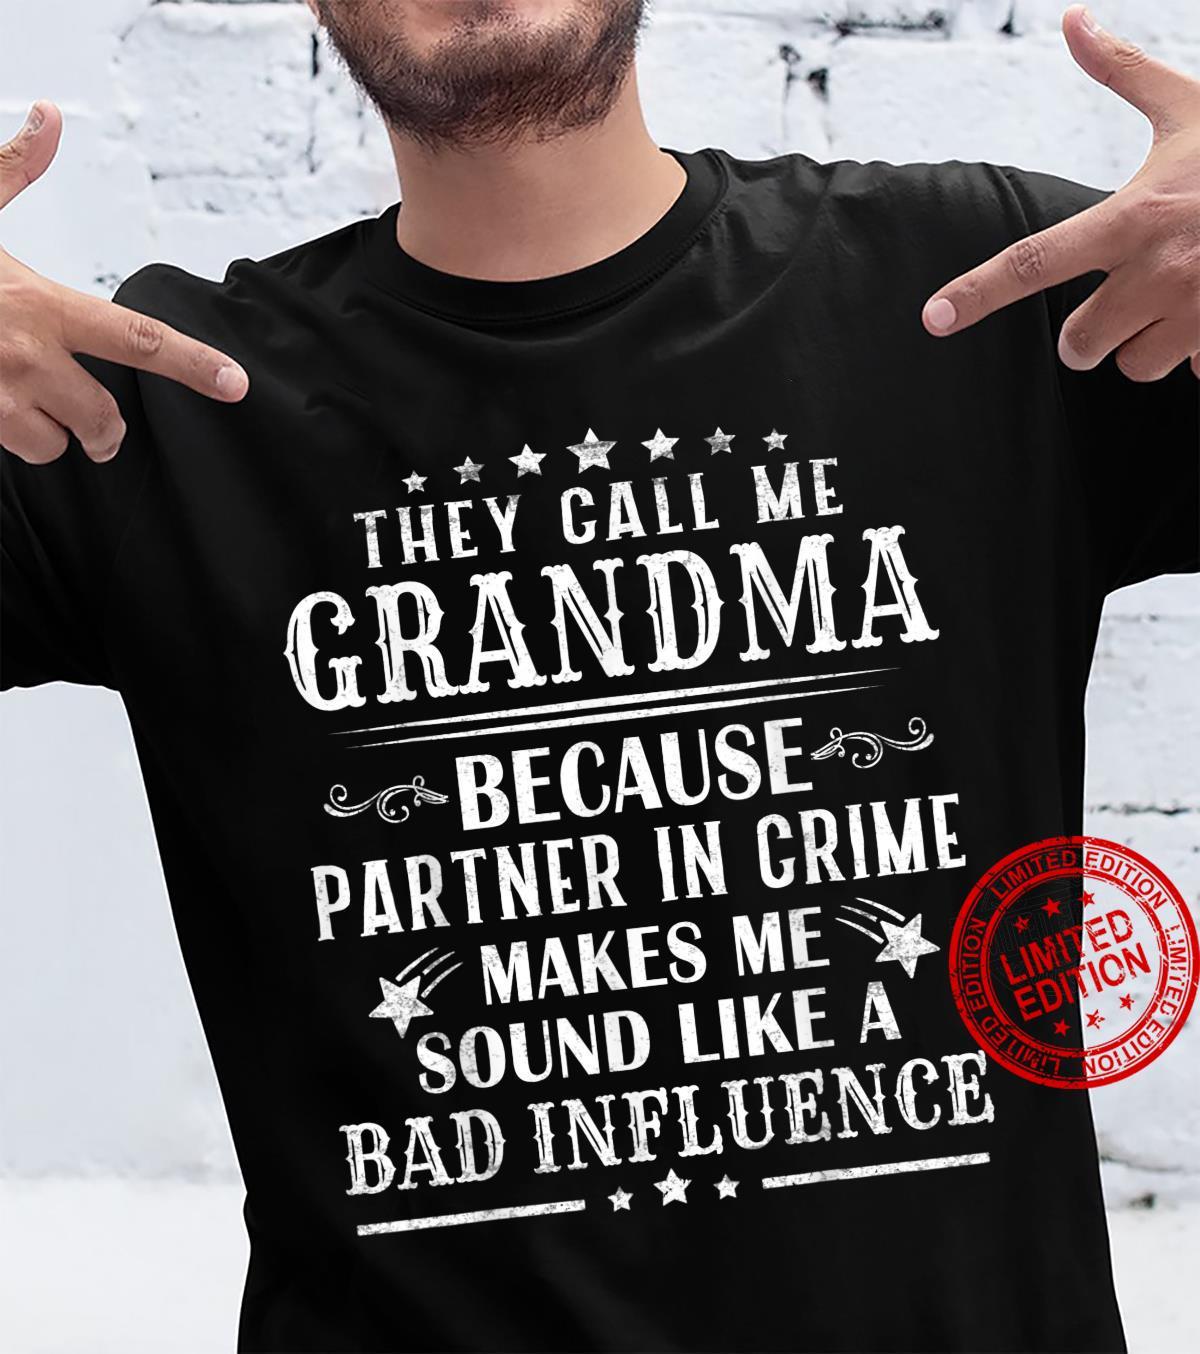 Funny Grandma Shirt, Grandma Partner In Crime Fathers Day Shirt